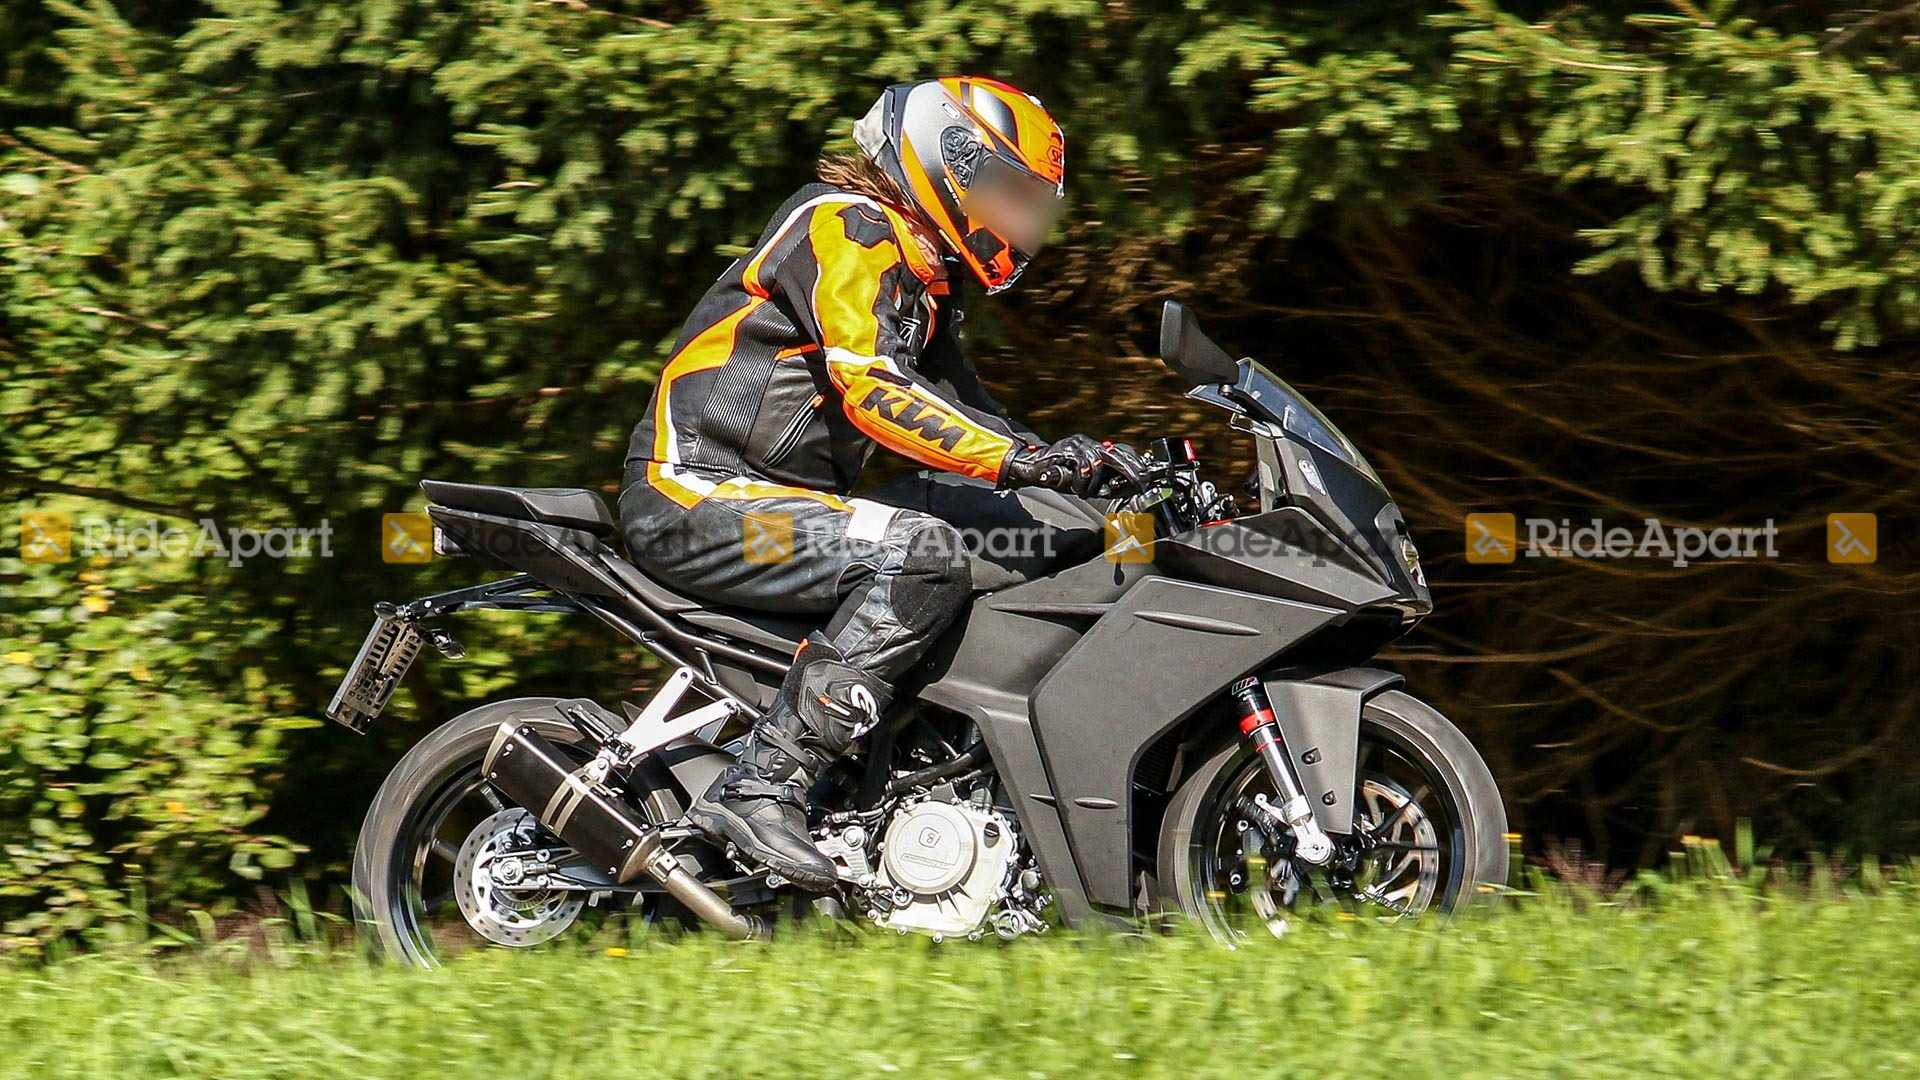 2021 KTM RC 390 Spy Shots